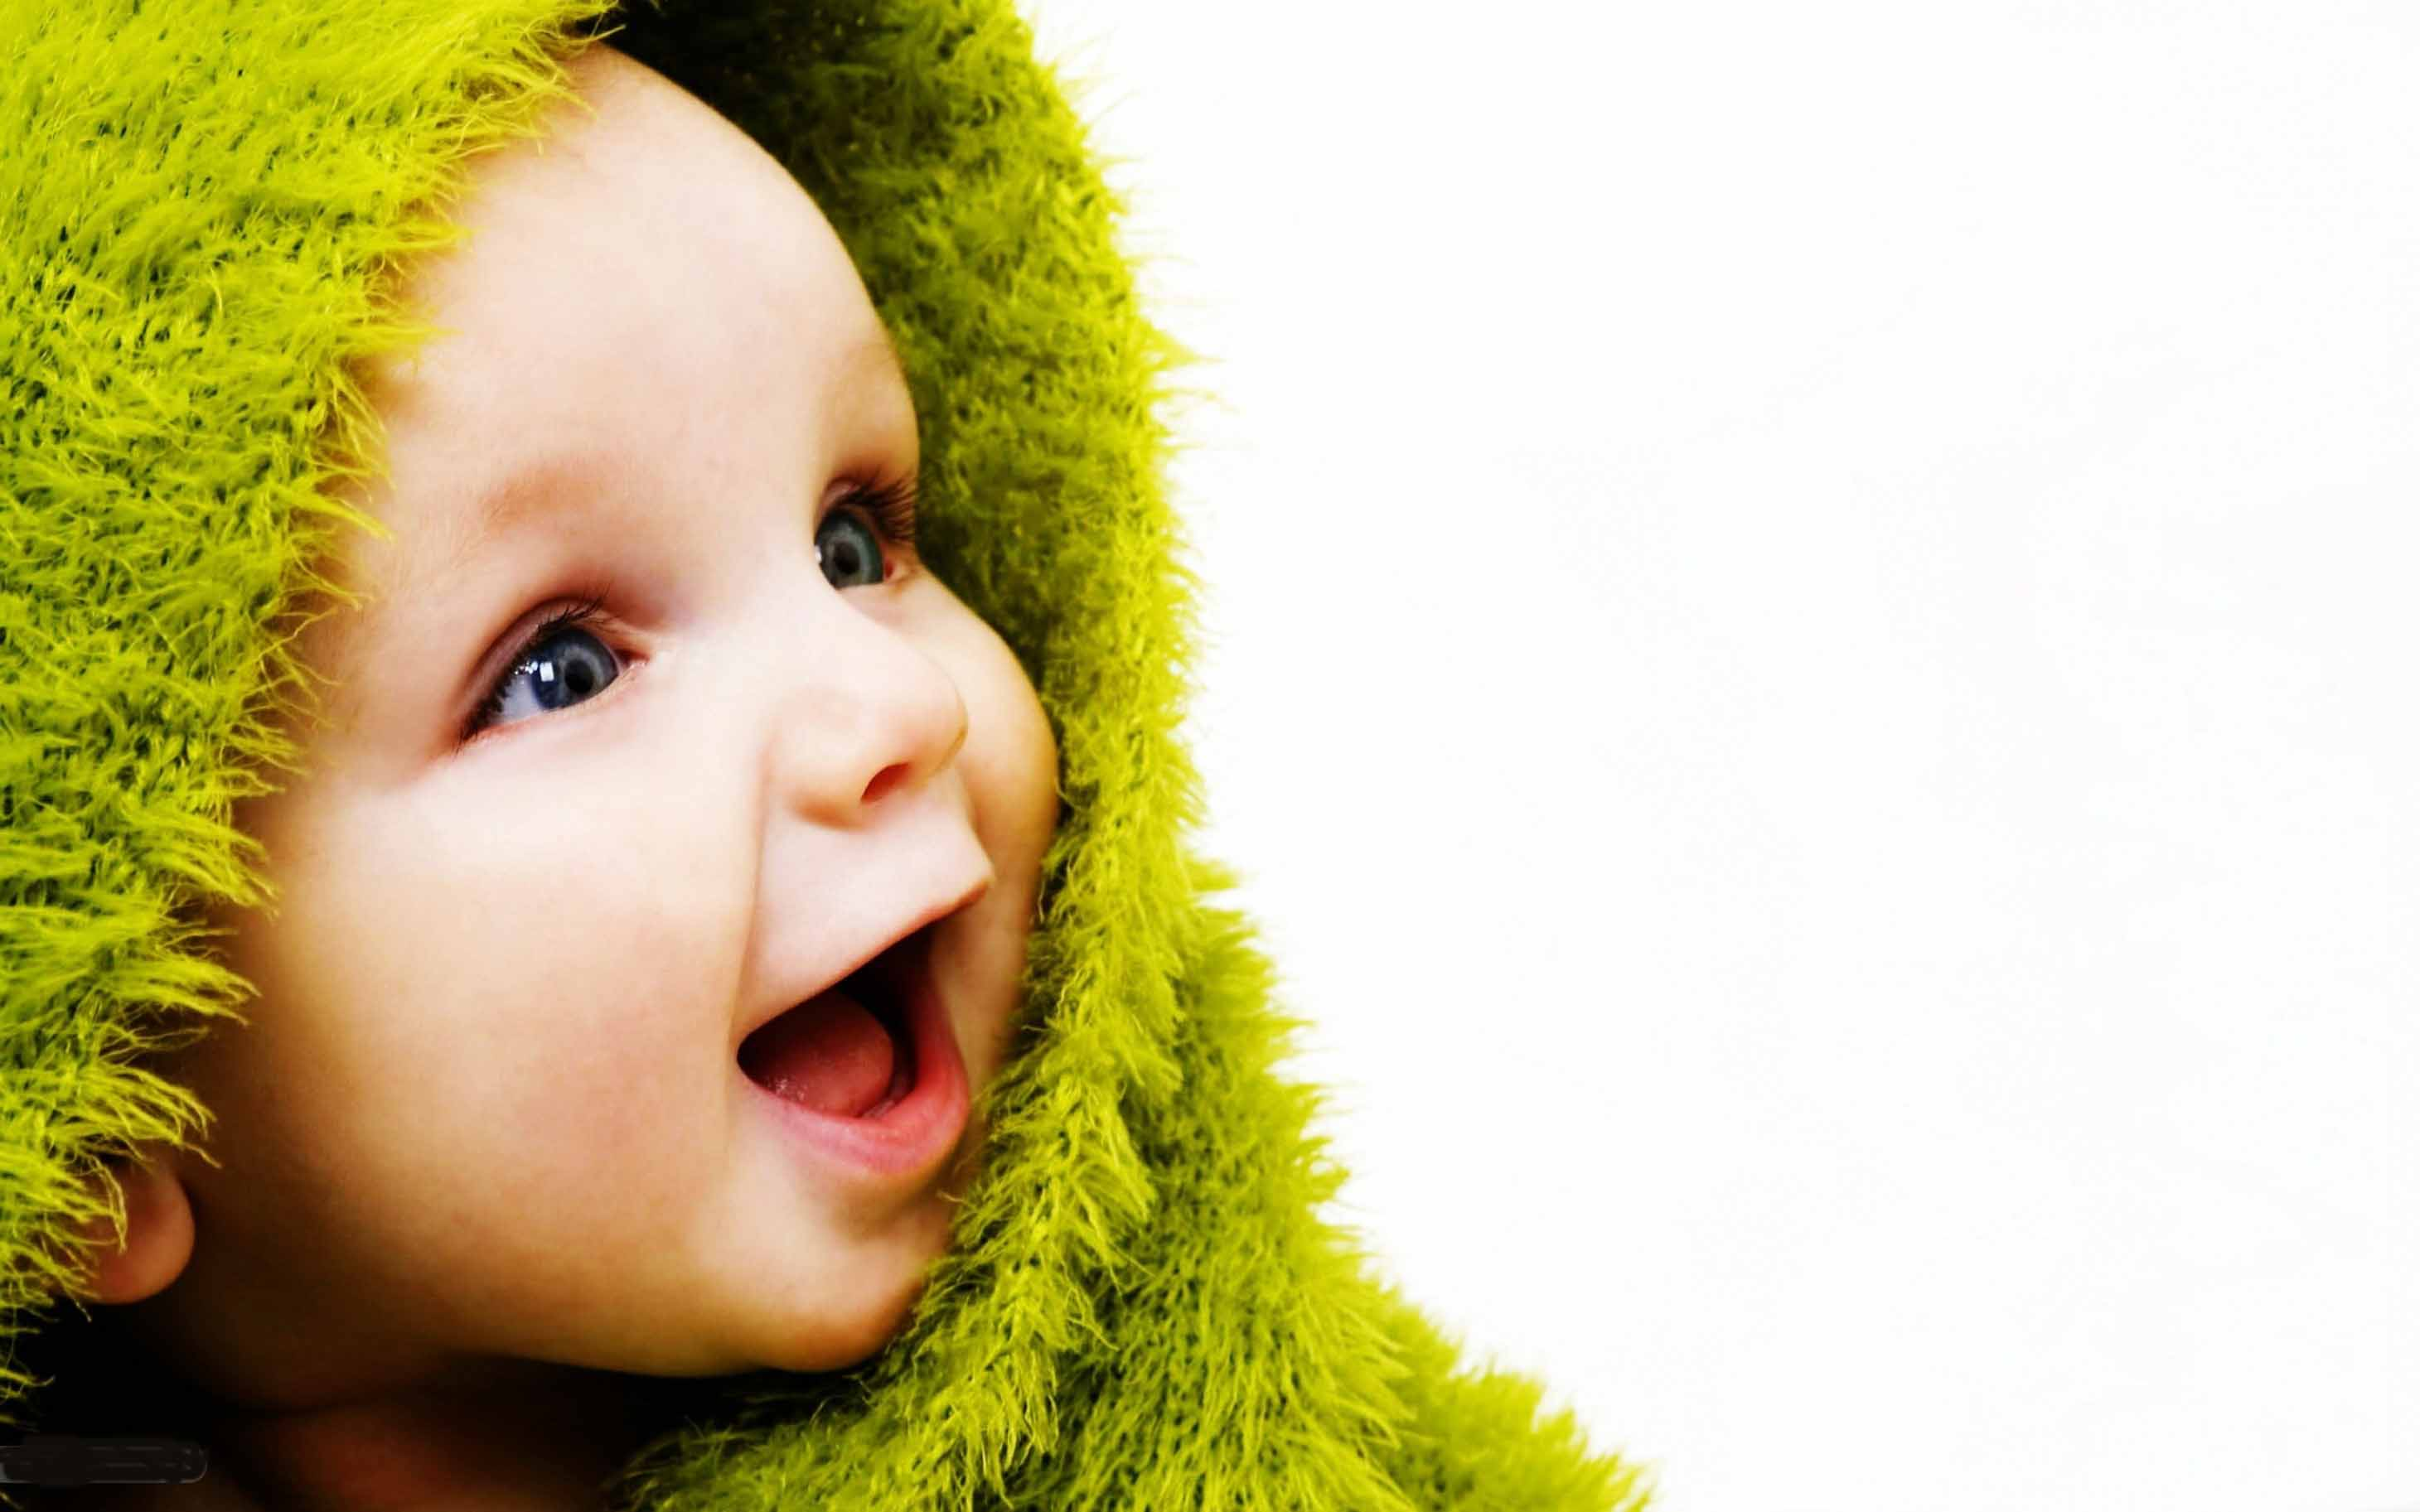 Cute Pic Baby - wallpaper hd